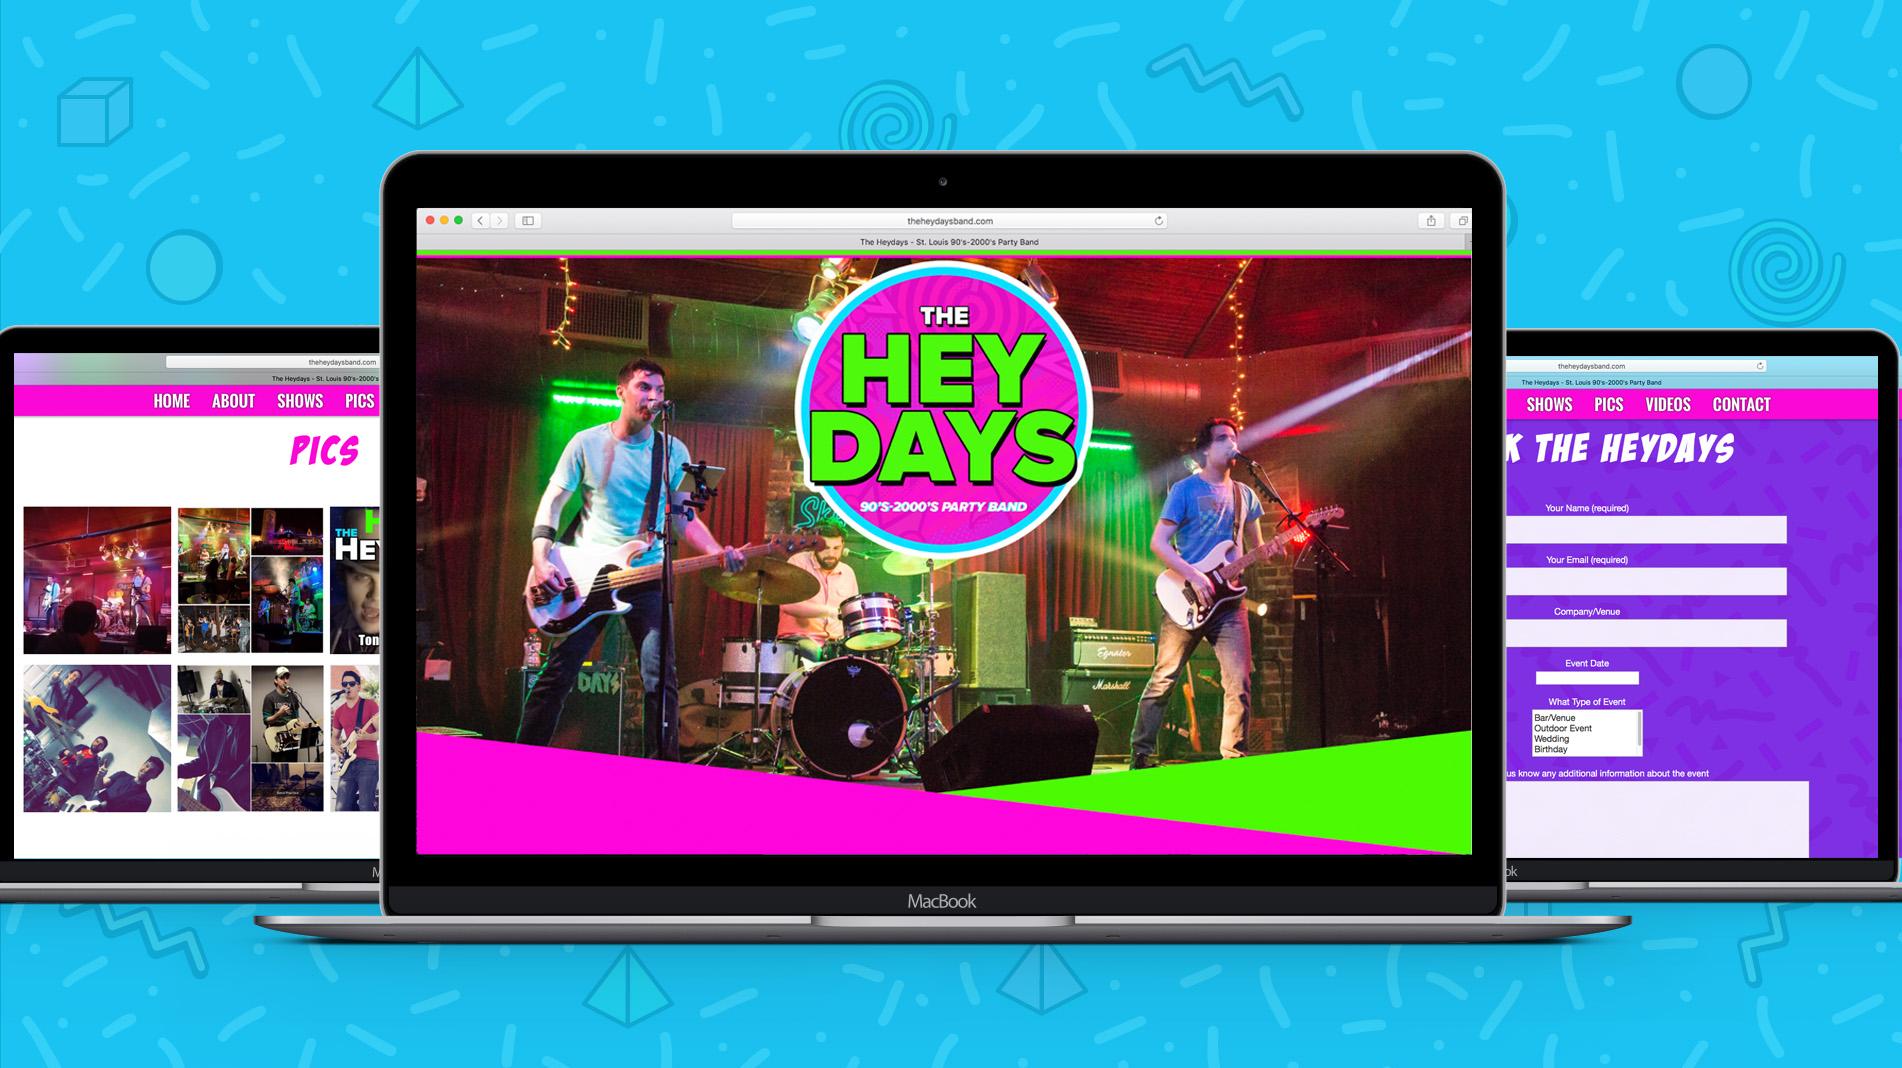 Heydayswebsite